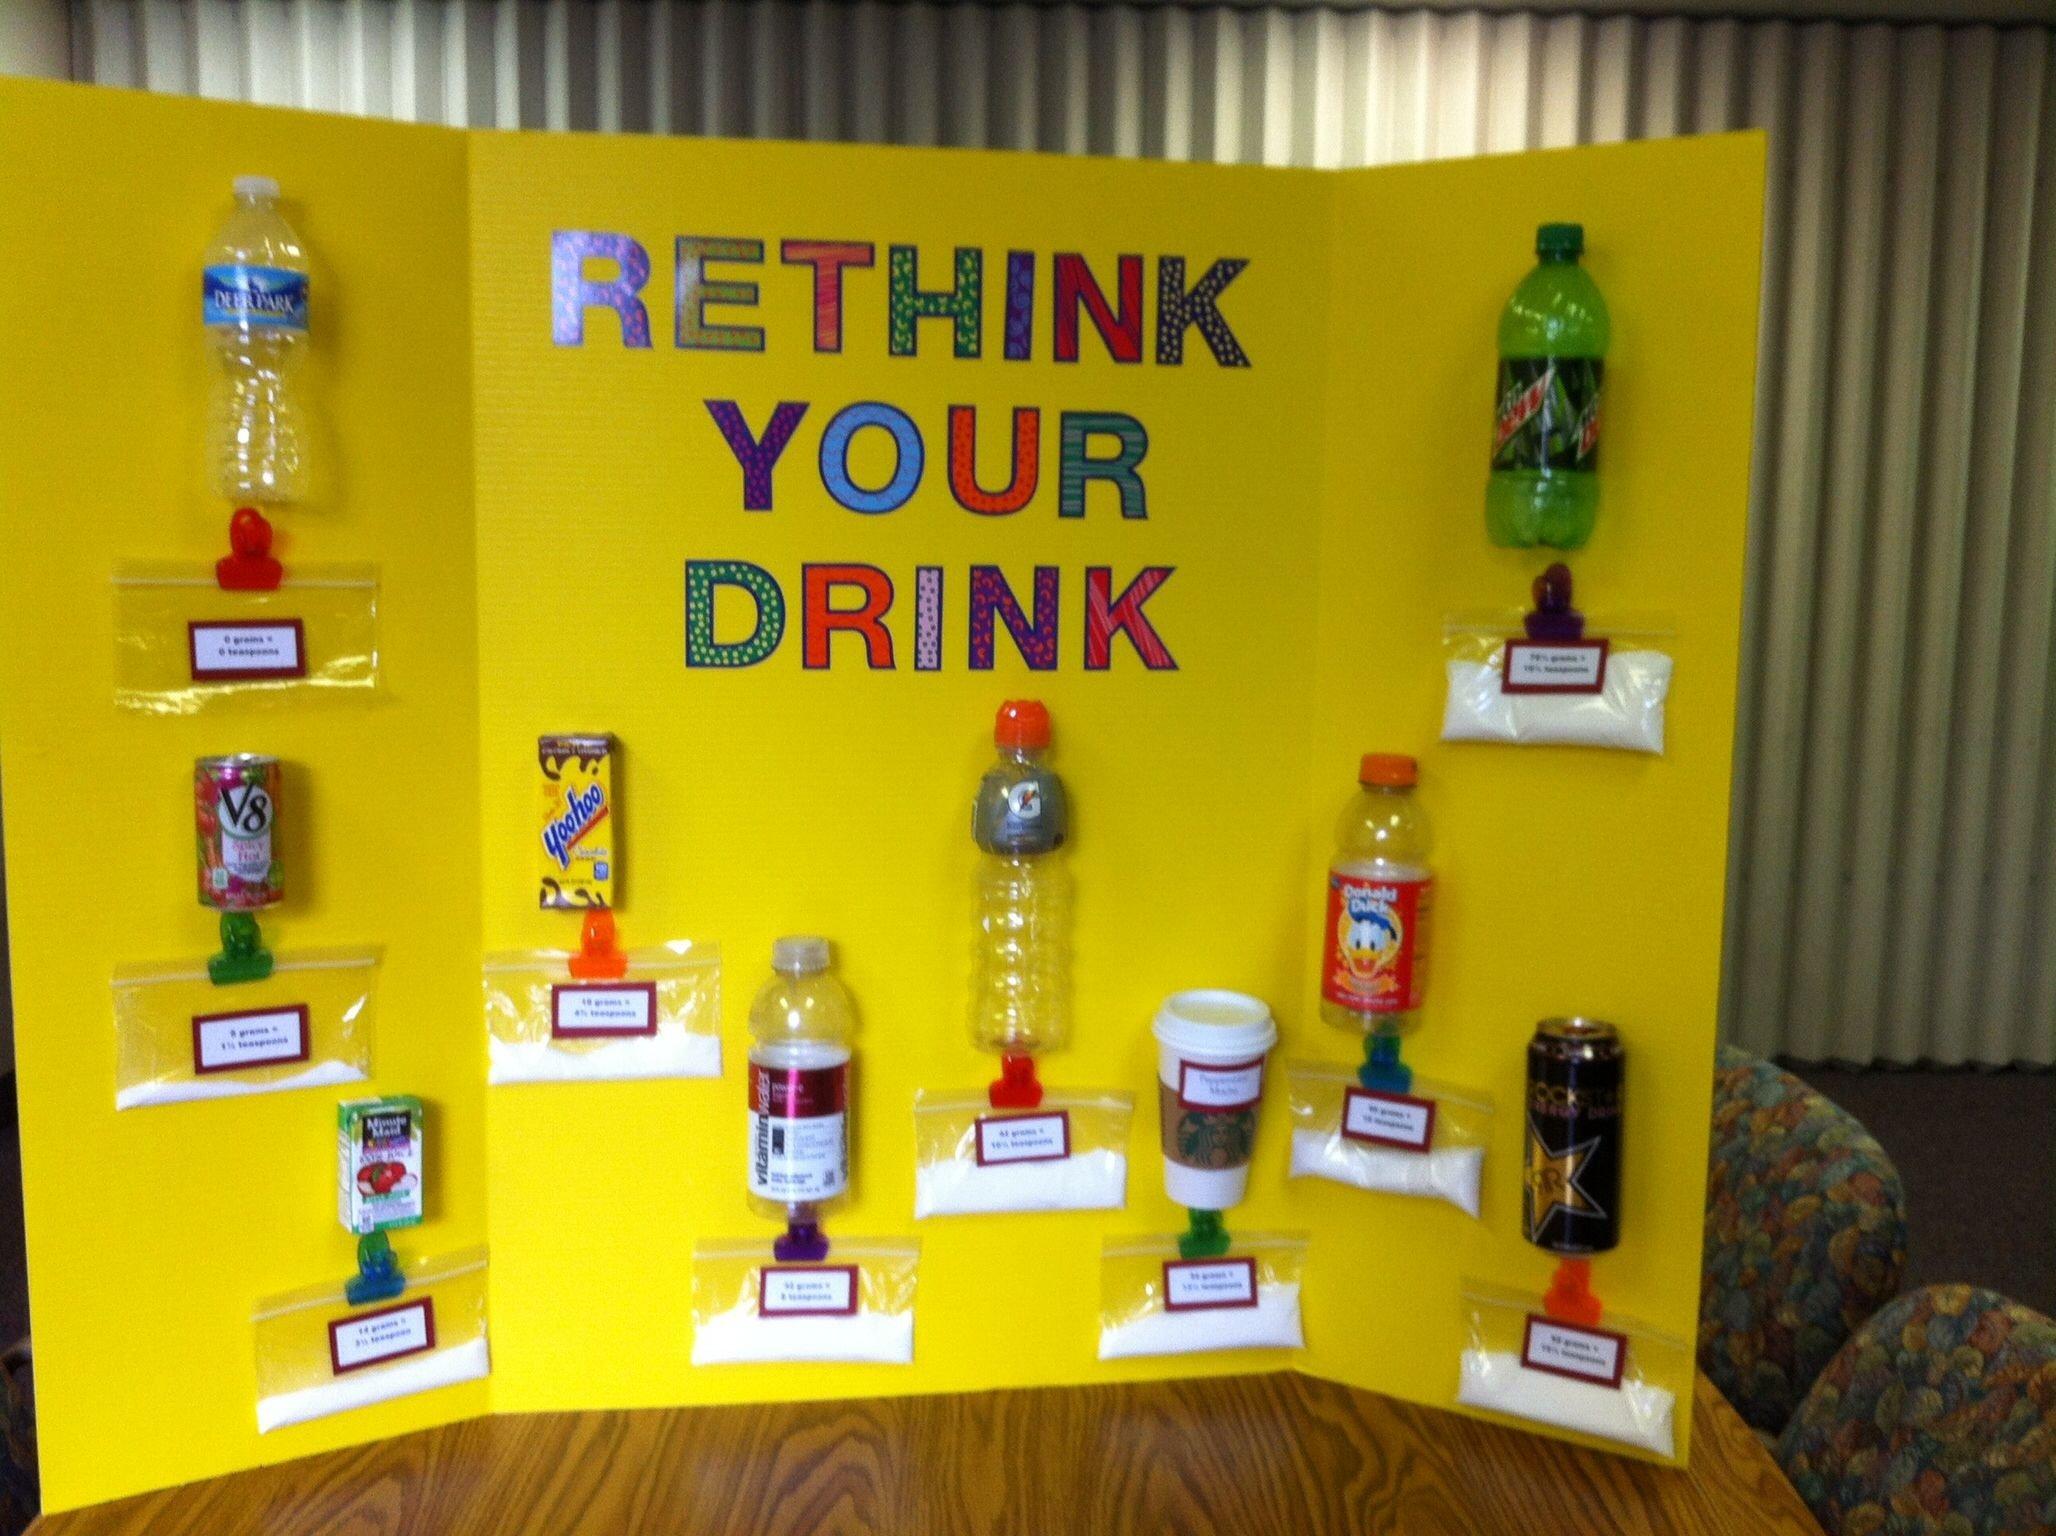 10 Stylish Health Fair Ideas For Kids health fair sugar content in drinks education pinterest 2021